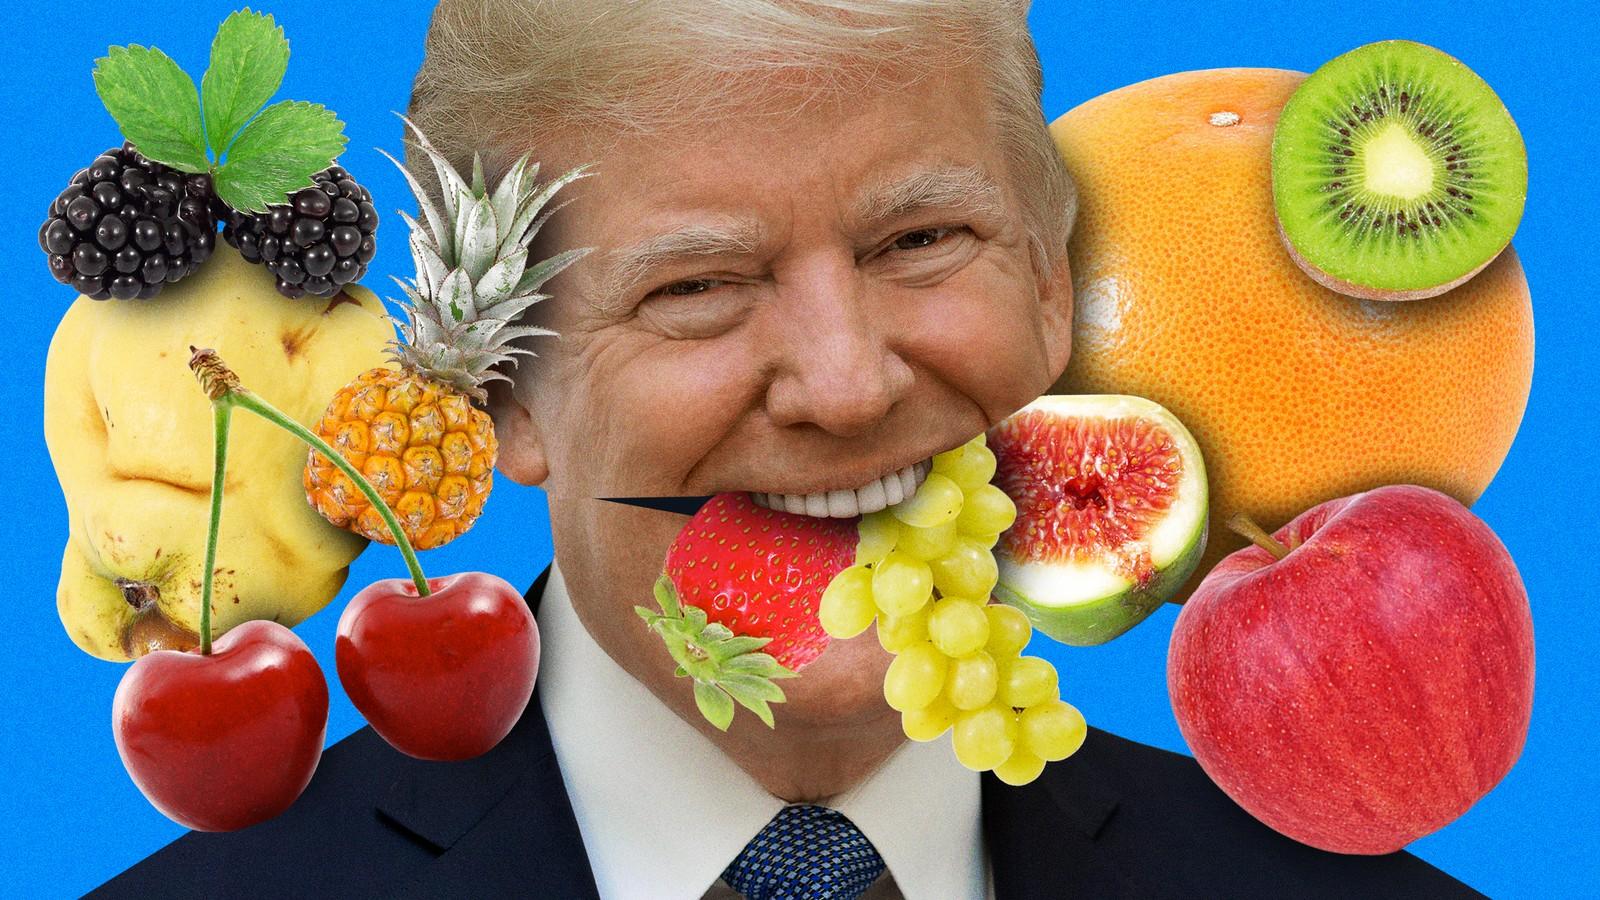 Has Donald Trump Ever Eaten A Piece Of Fruit?